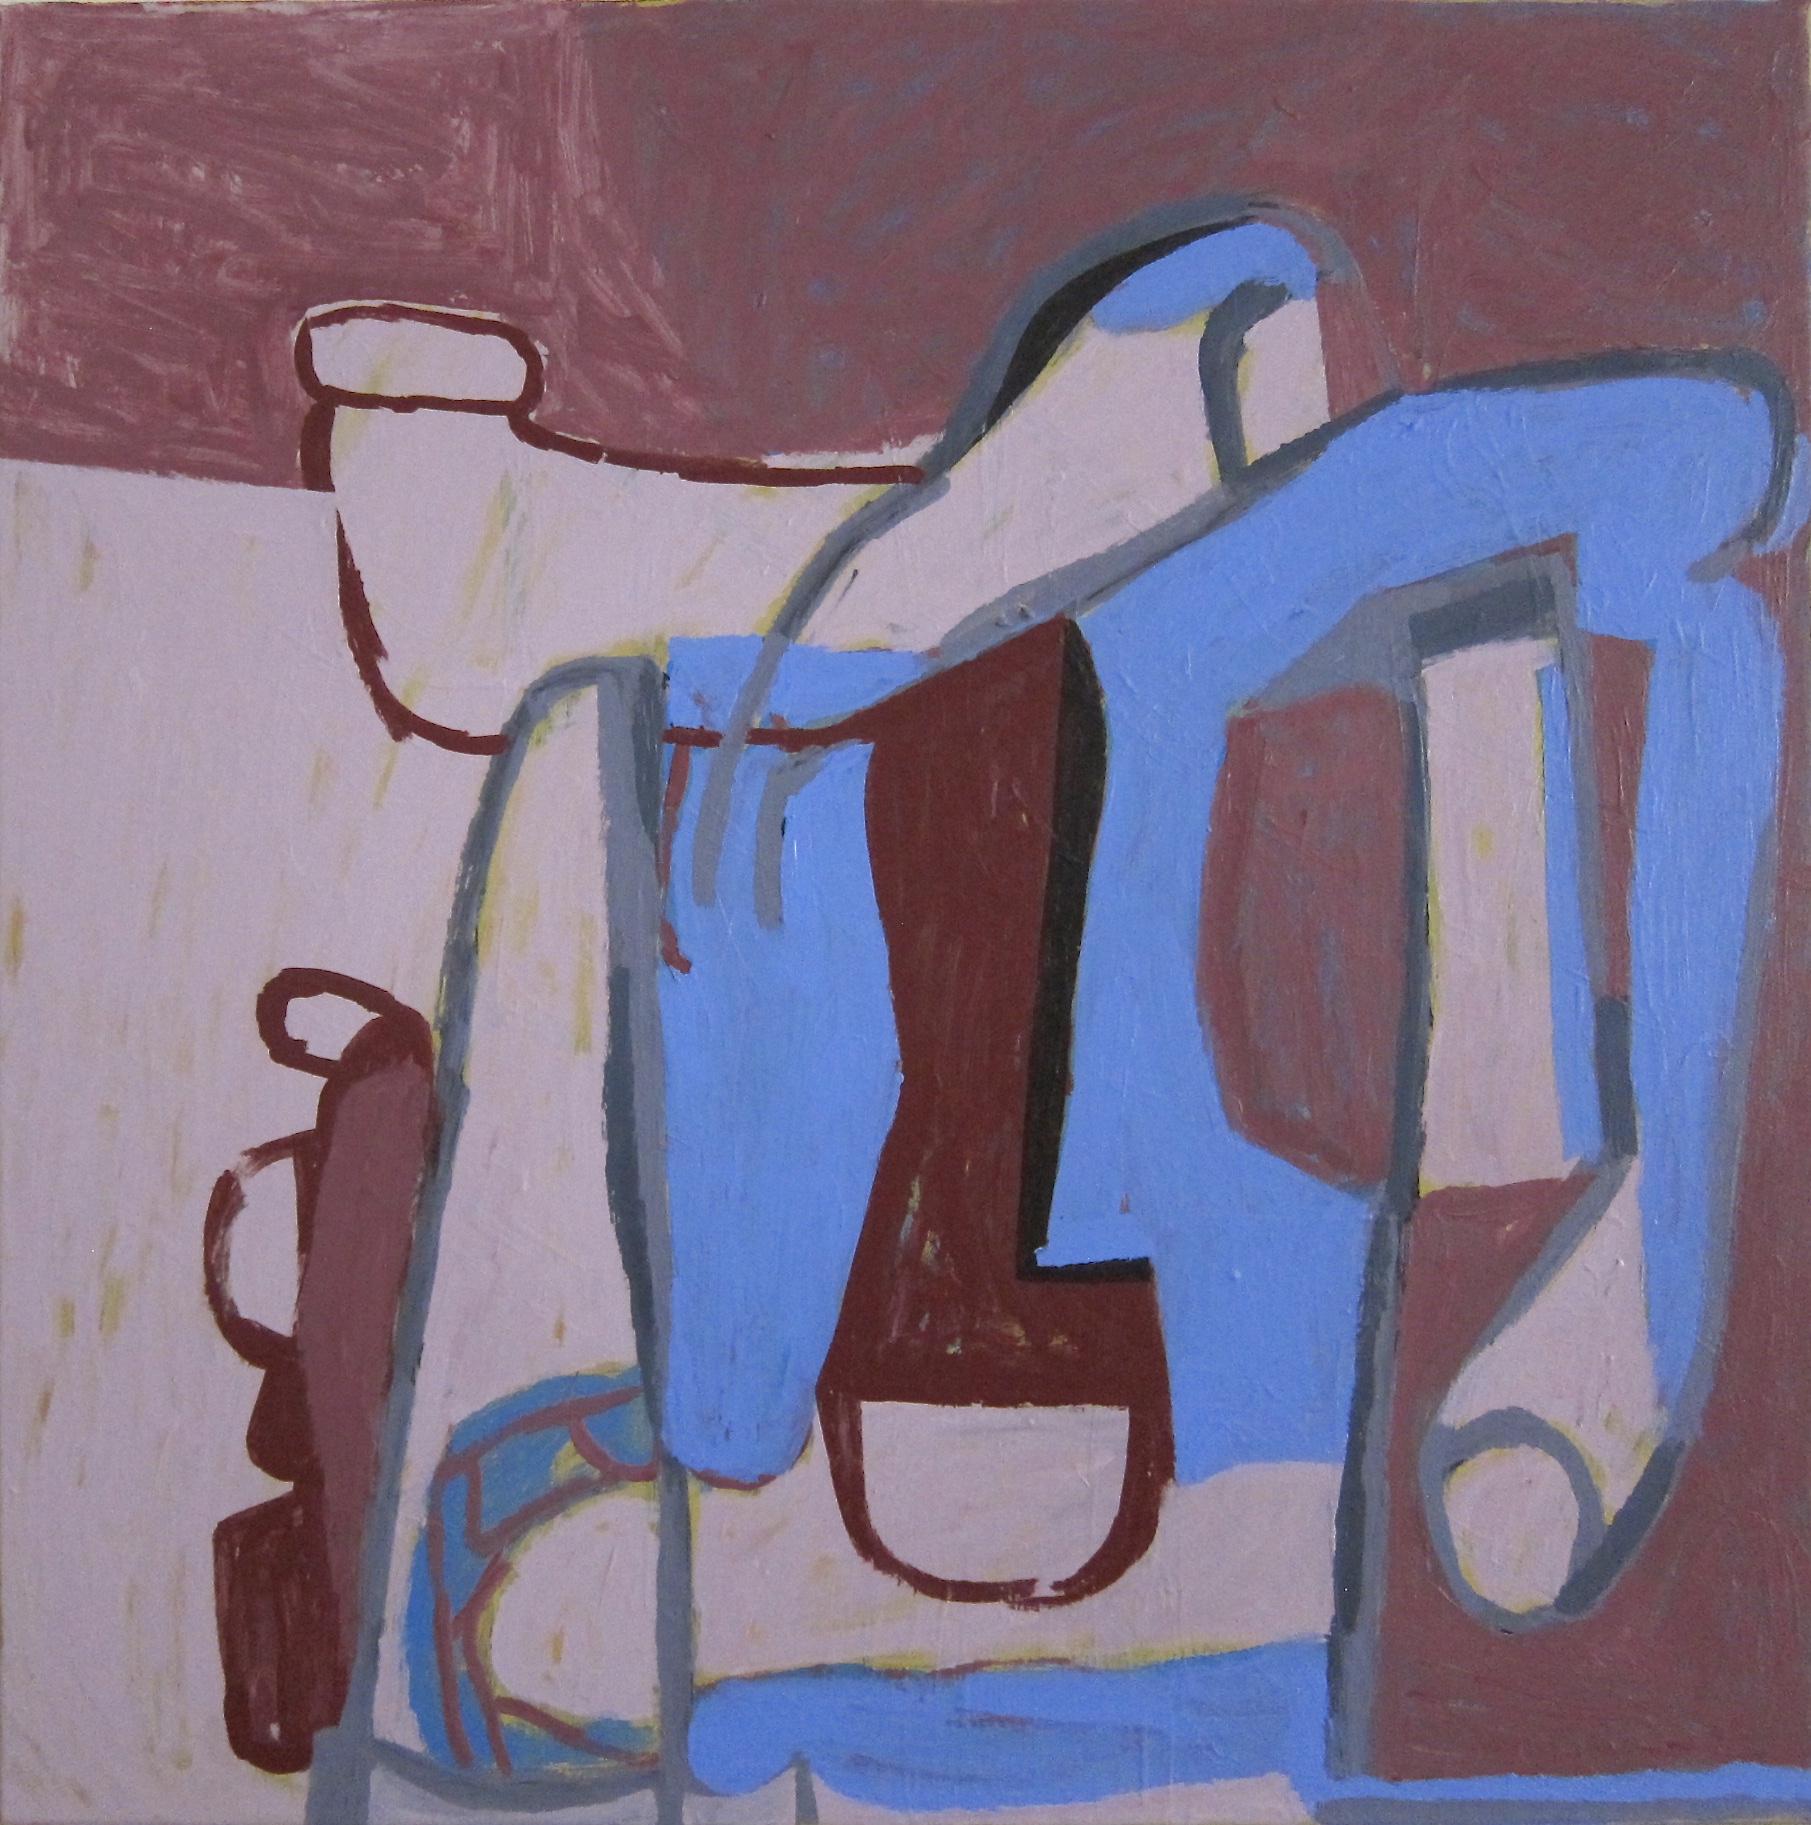 Acrylic on canvas, 60 x 60 cm. June/July 2018. | Sarah Hoskins\' Journal